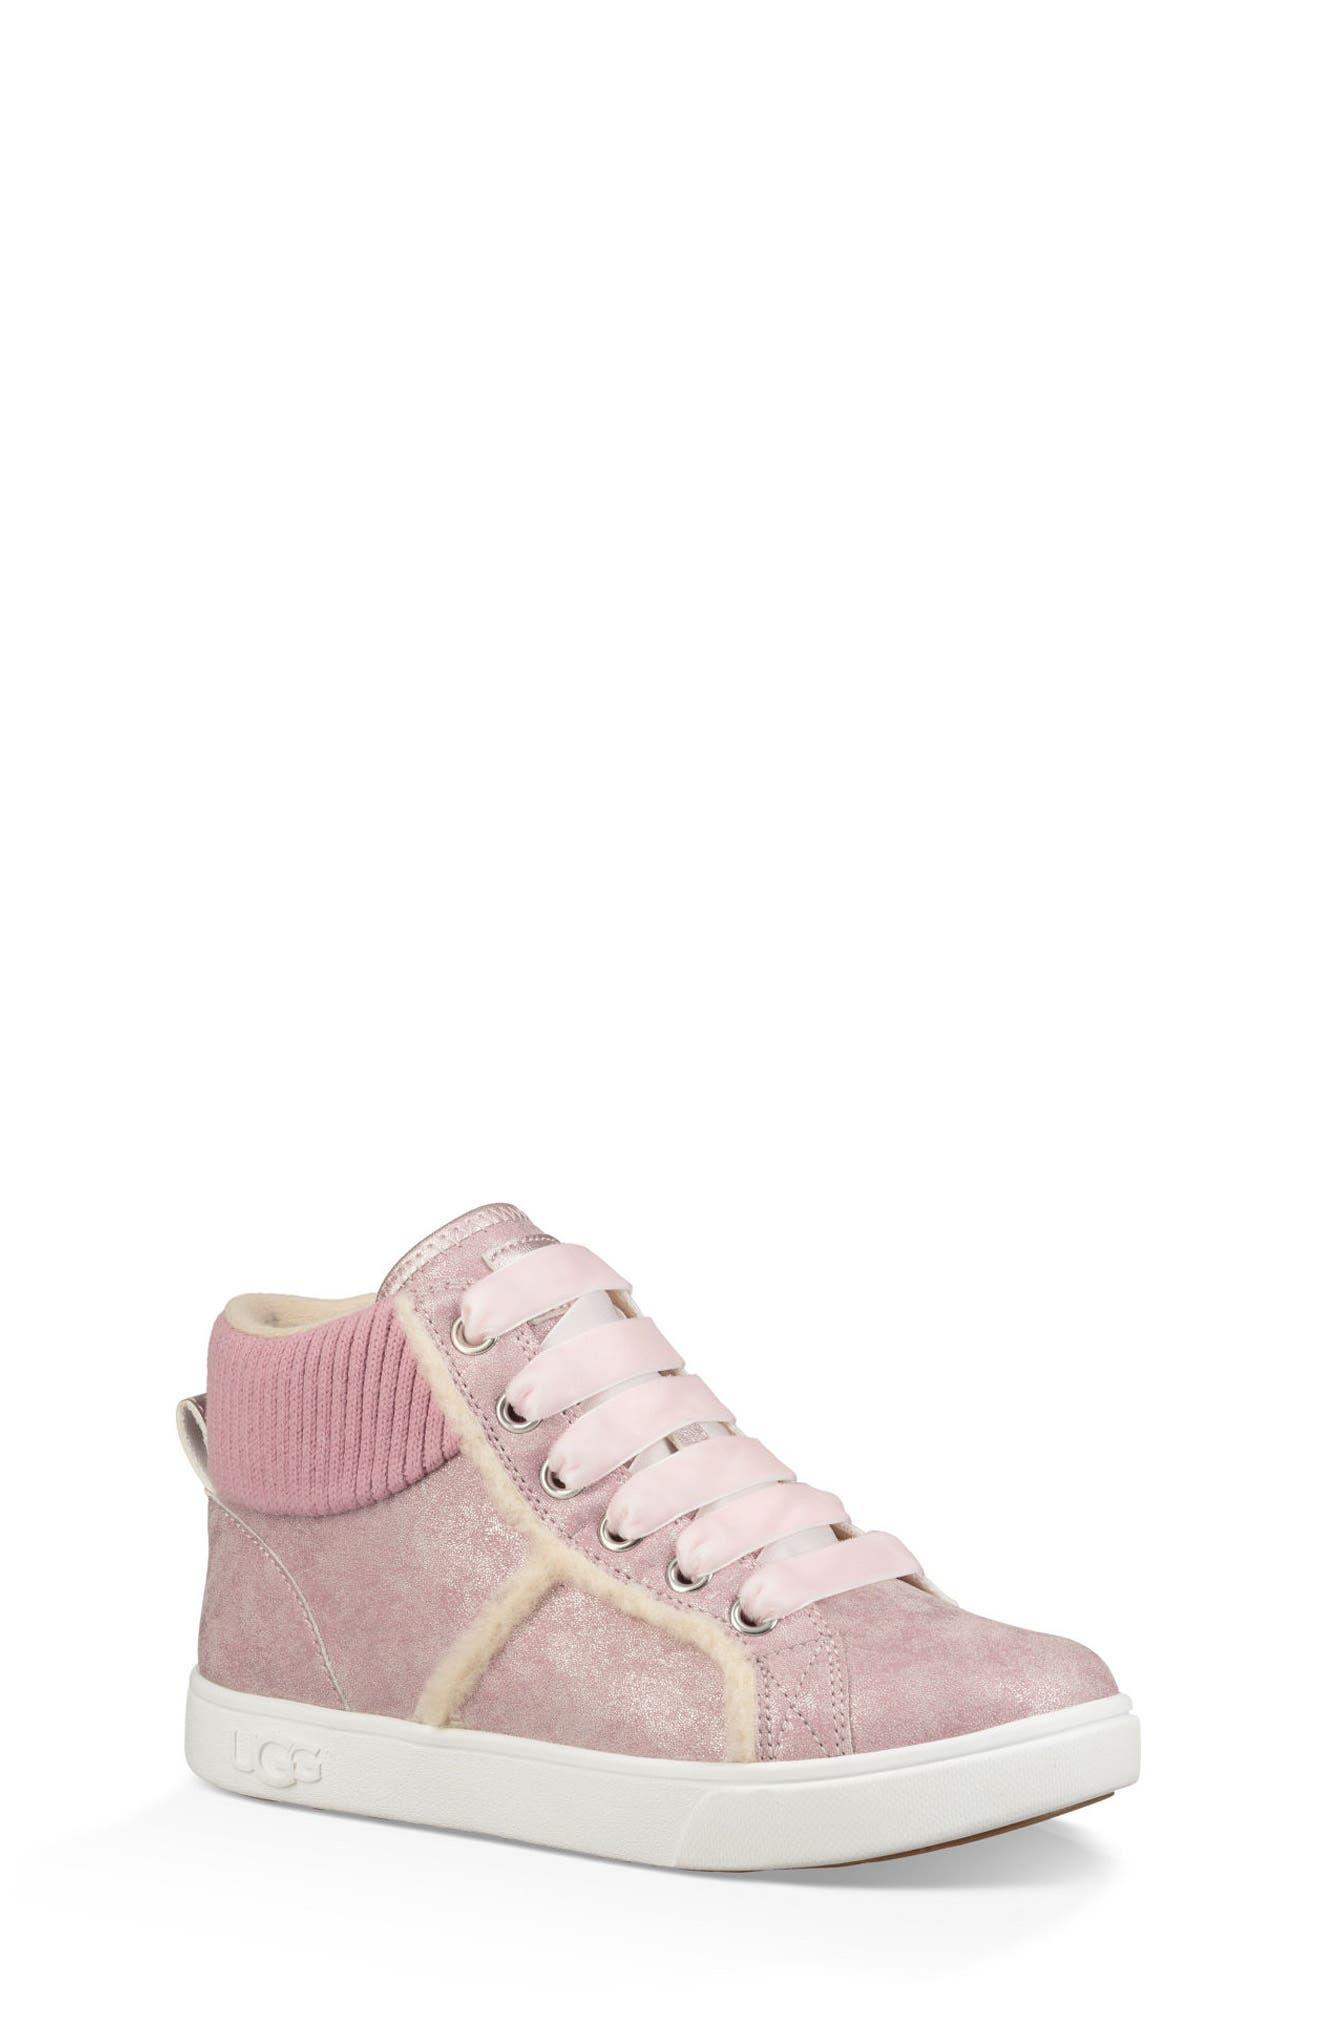 Girls Ugg Addie High Top Sneaker Size 13 M  Pink